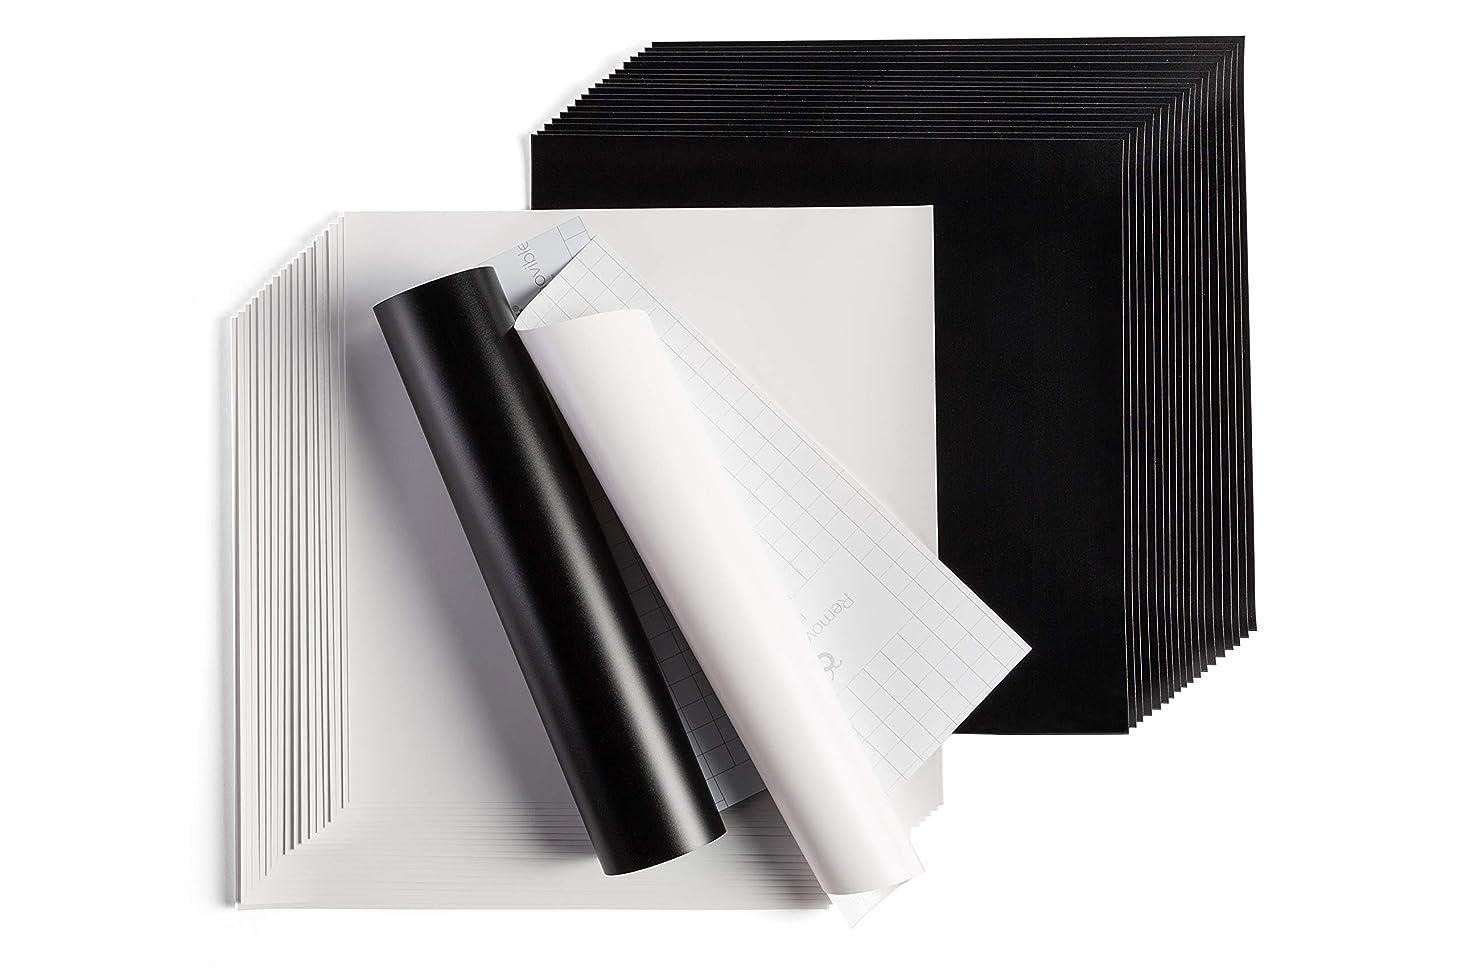 Cricut Removable Vinyl Pack, 40 Sheets Black/White